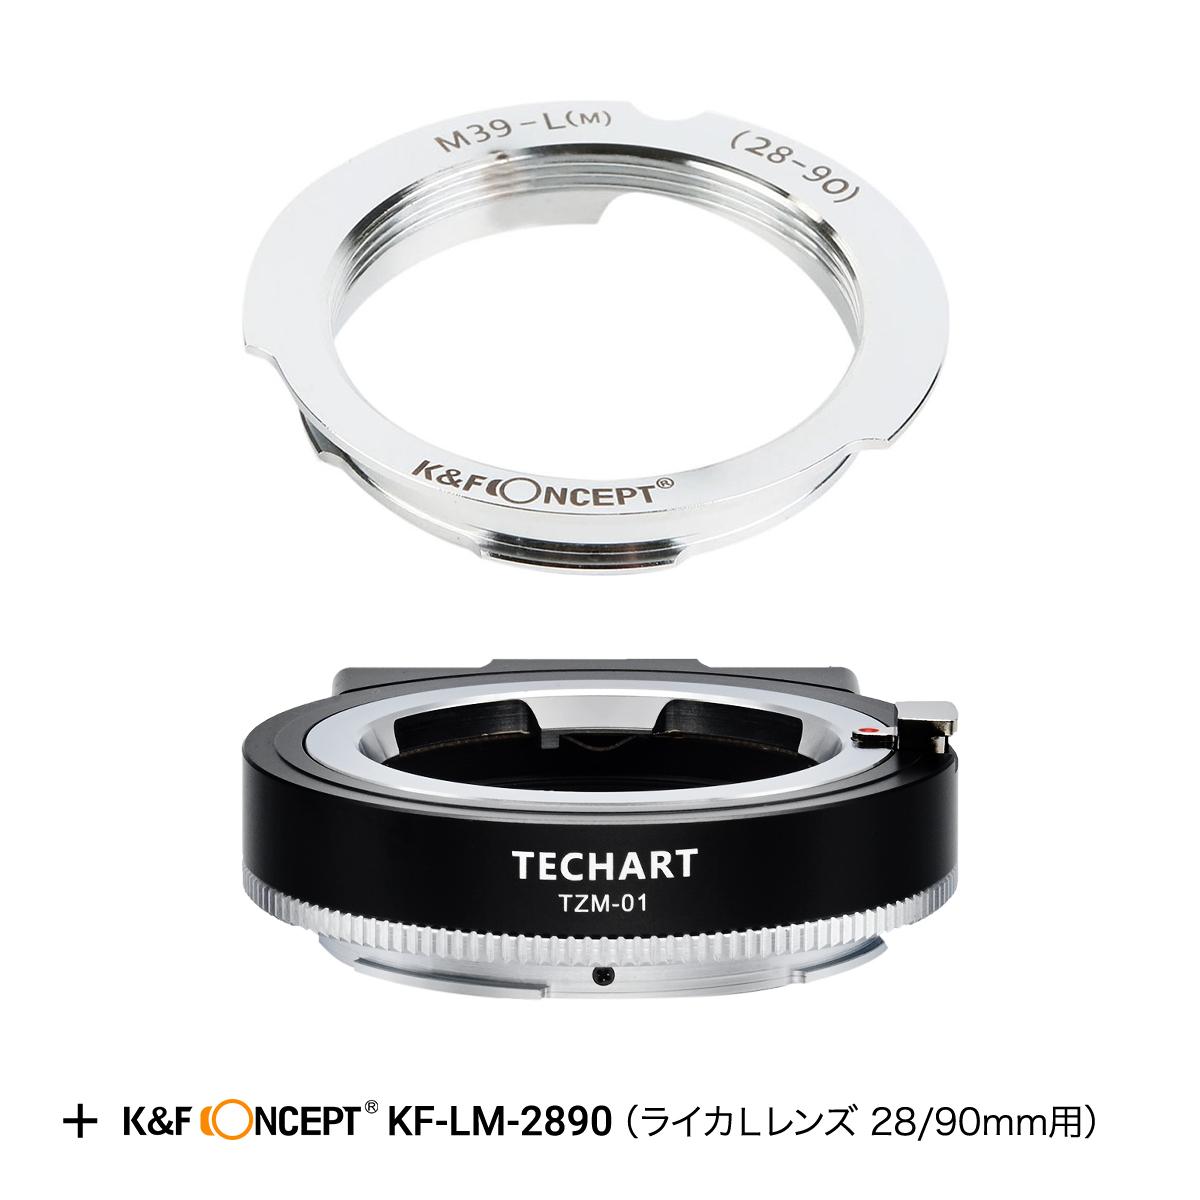 TECHART TZM-01 マウントアダプター セット